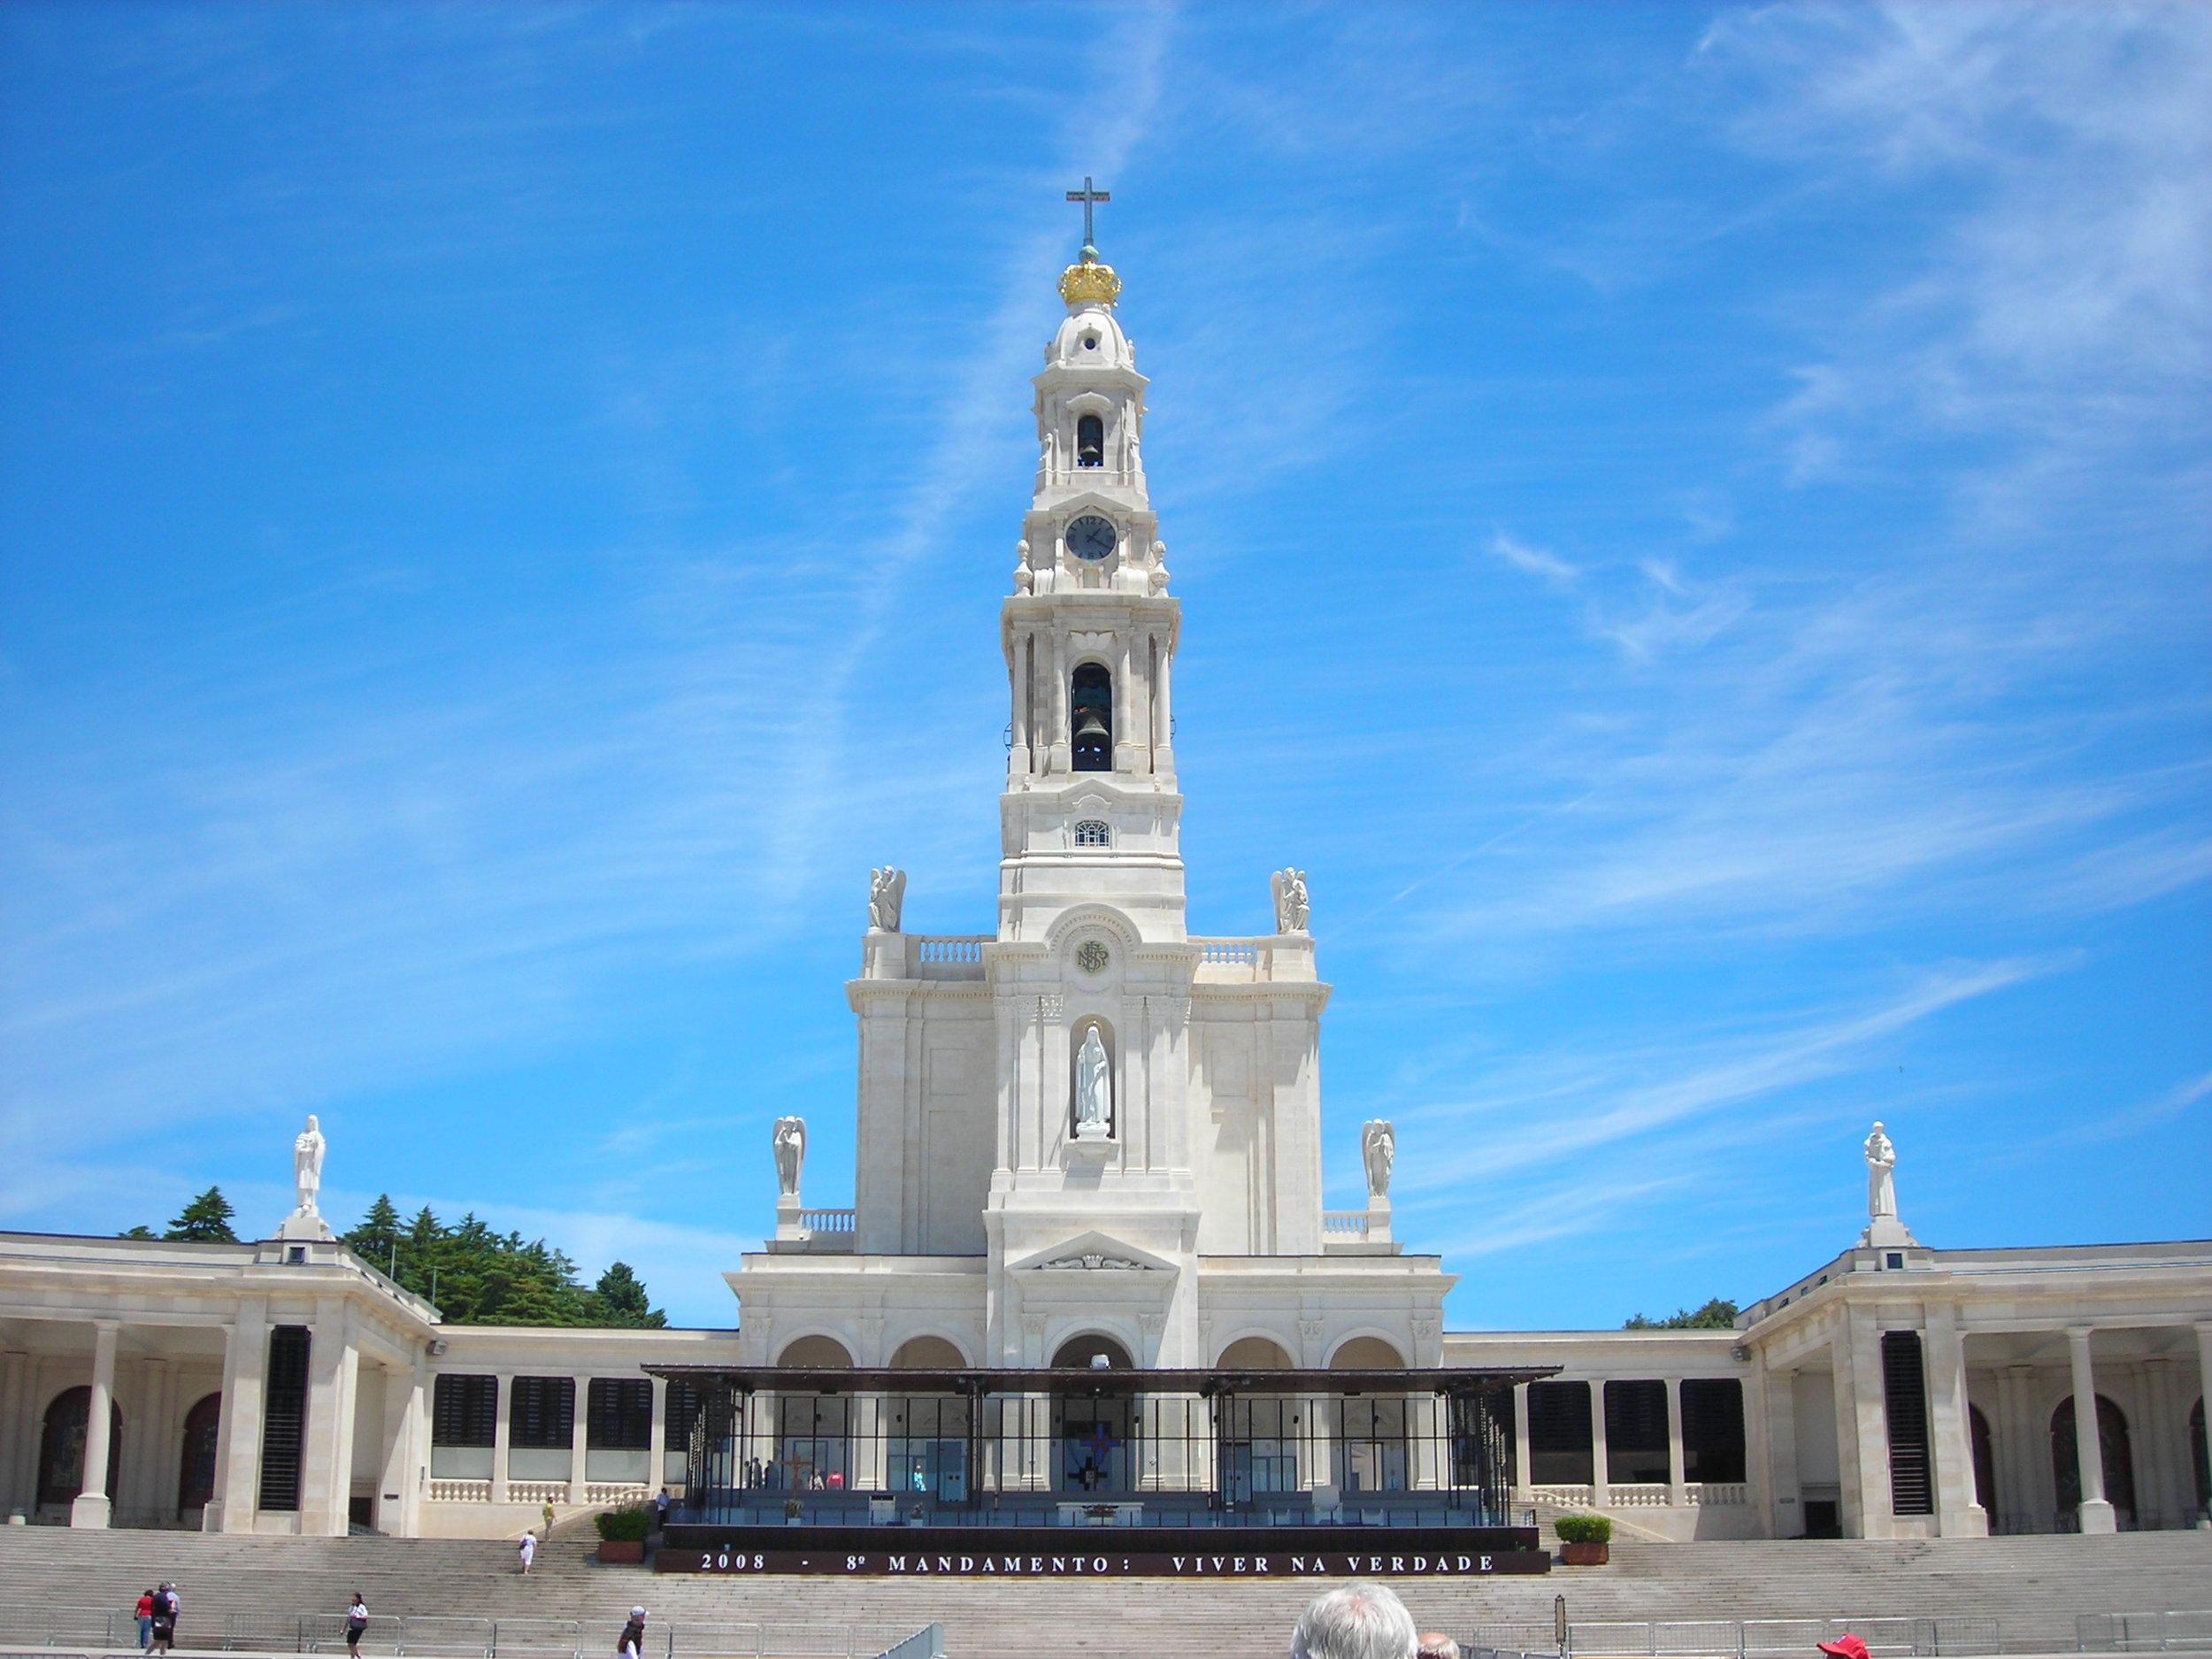 good-shepherd-travel-holy-land-tours-and-pilgrimages-fatima.jpg